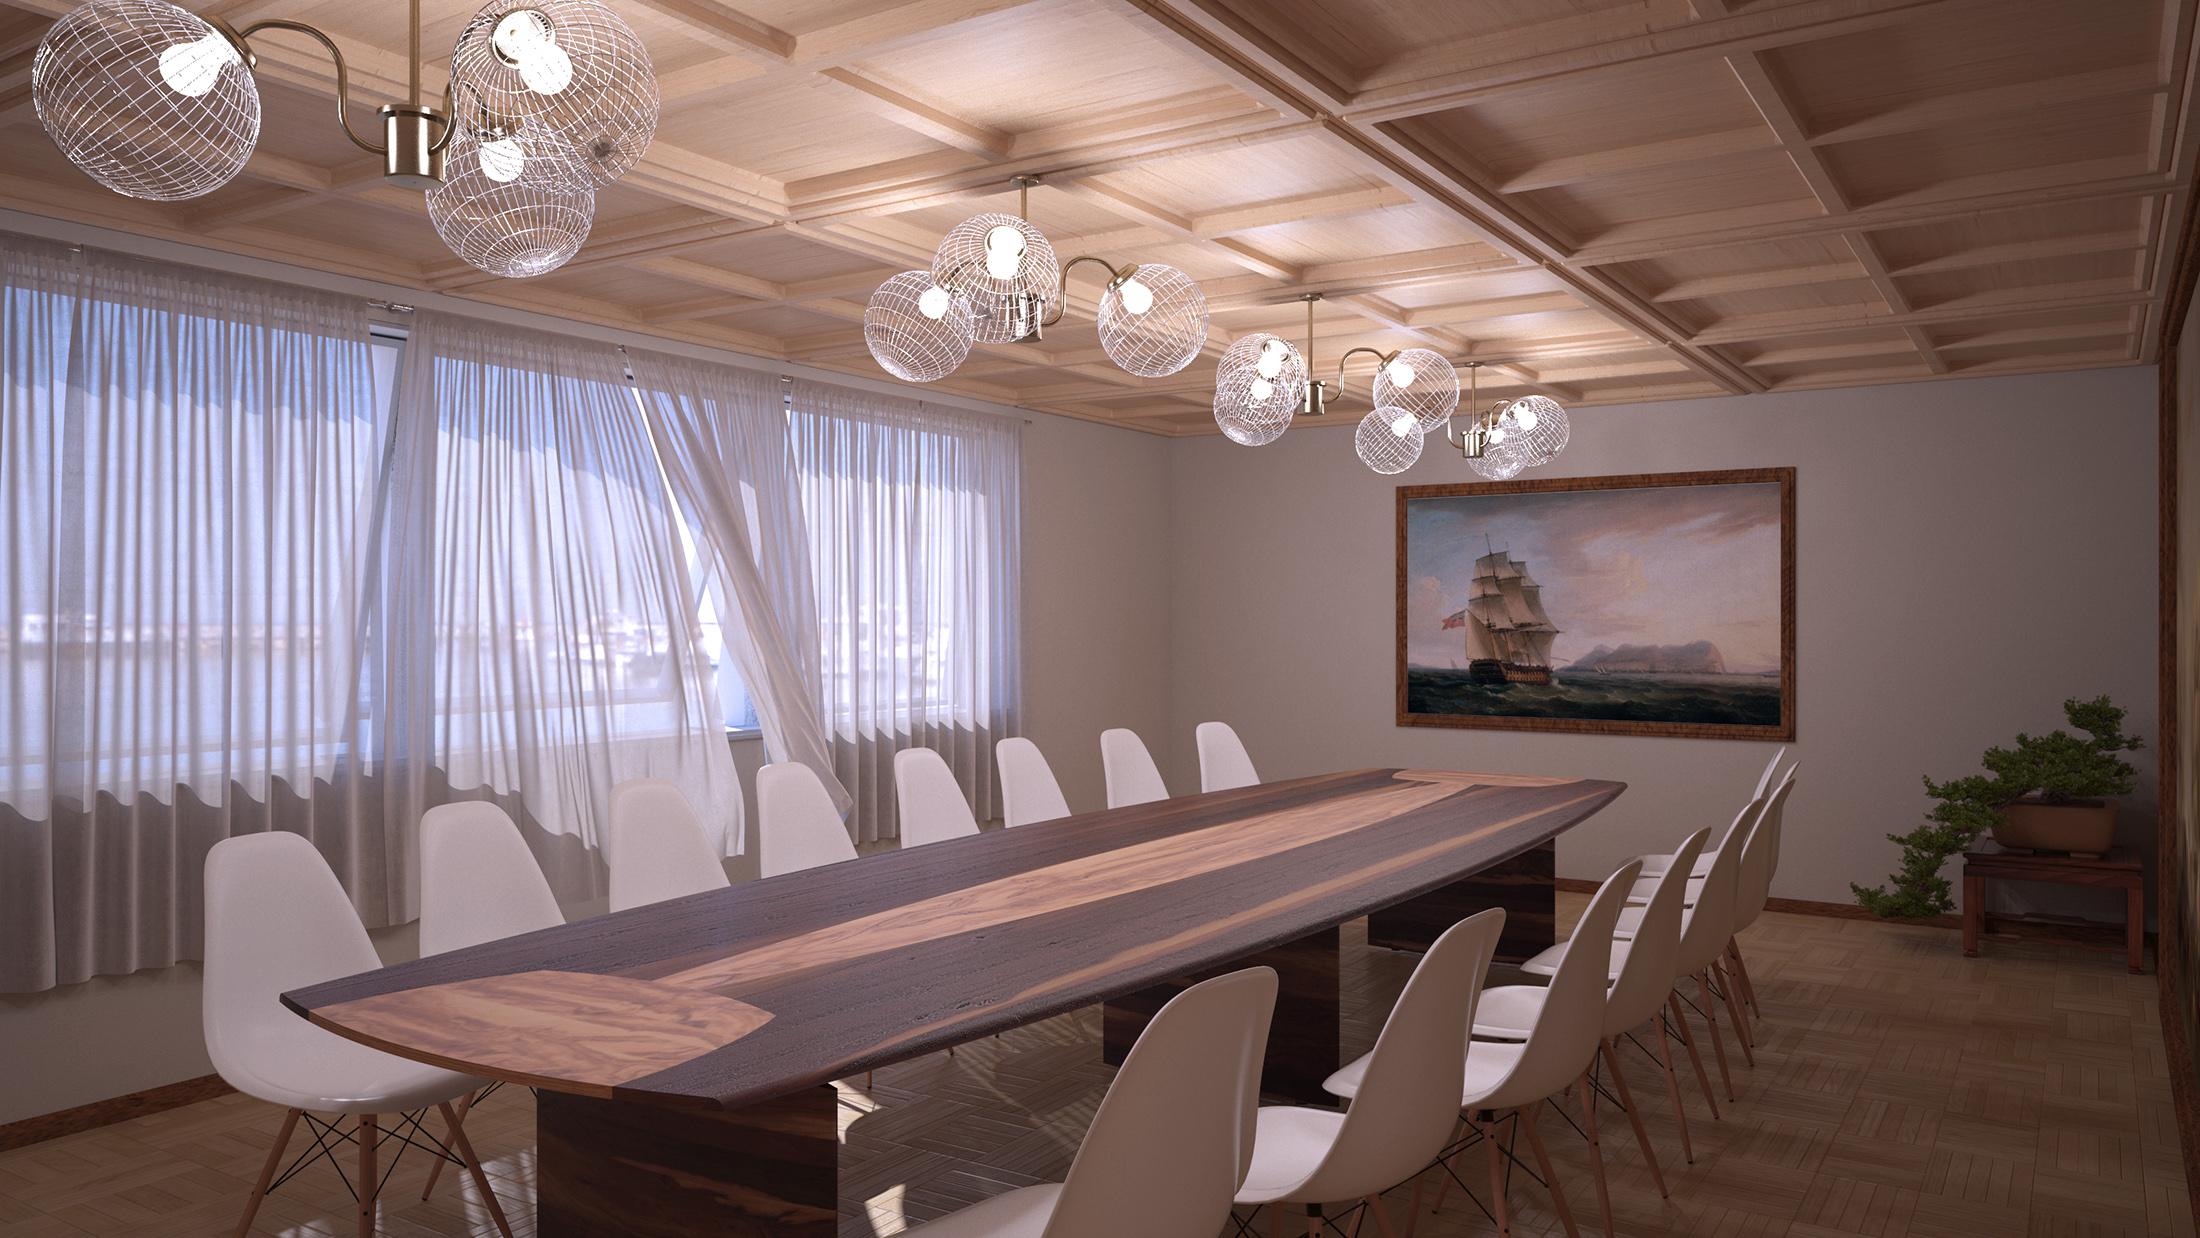 Sala riunioni marina final architettura e interior for Sala riunioni